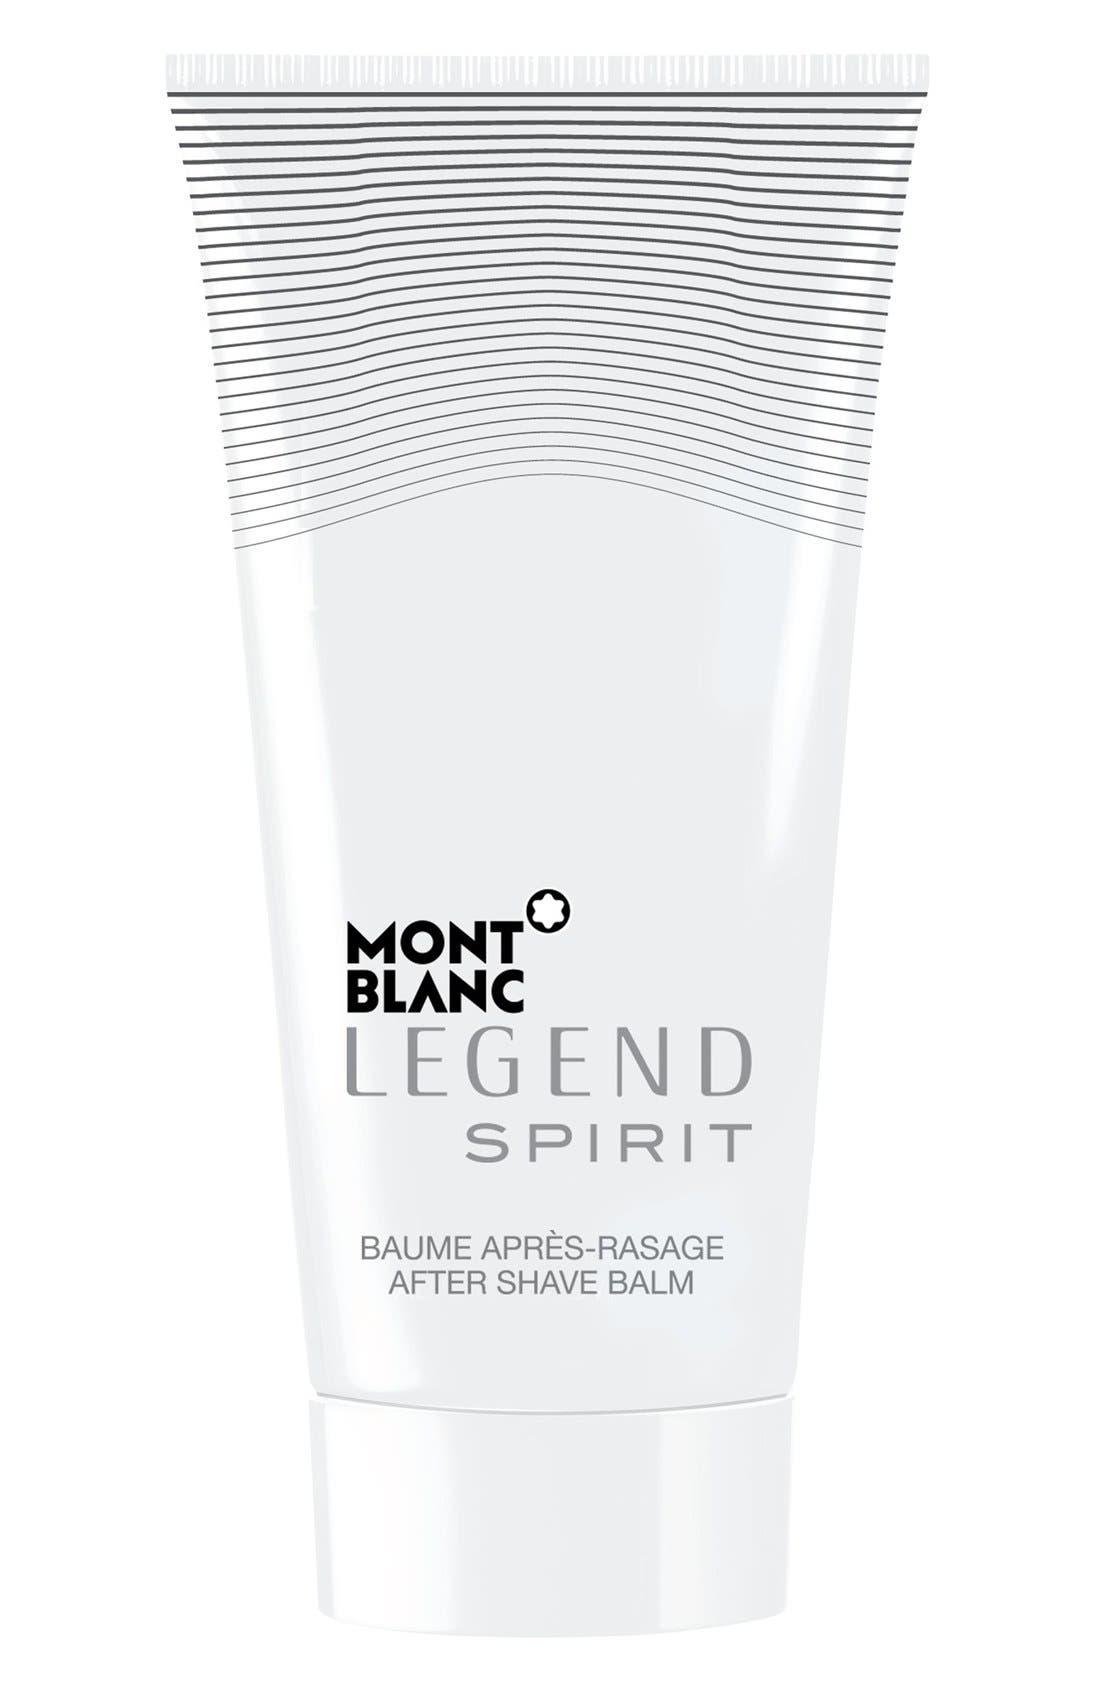 MONTBLANC 'Legend Spirit' After Shave Balm